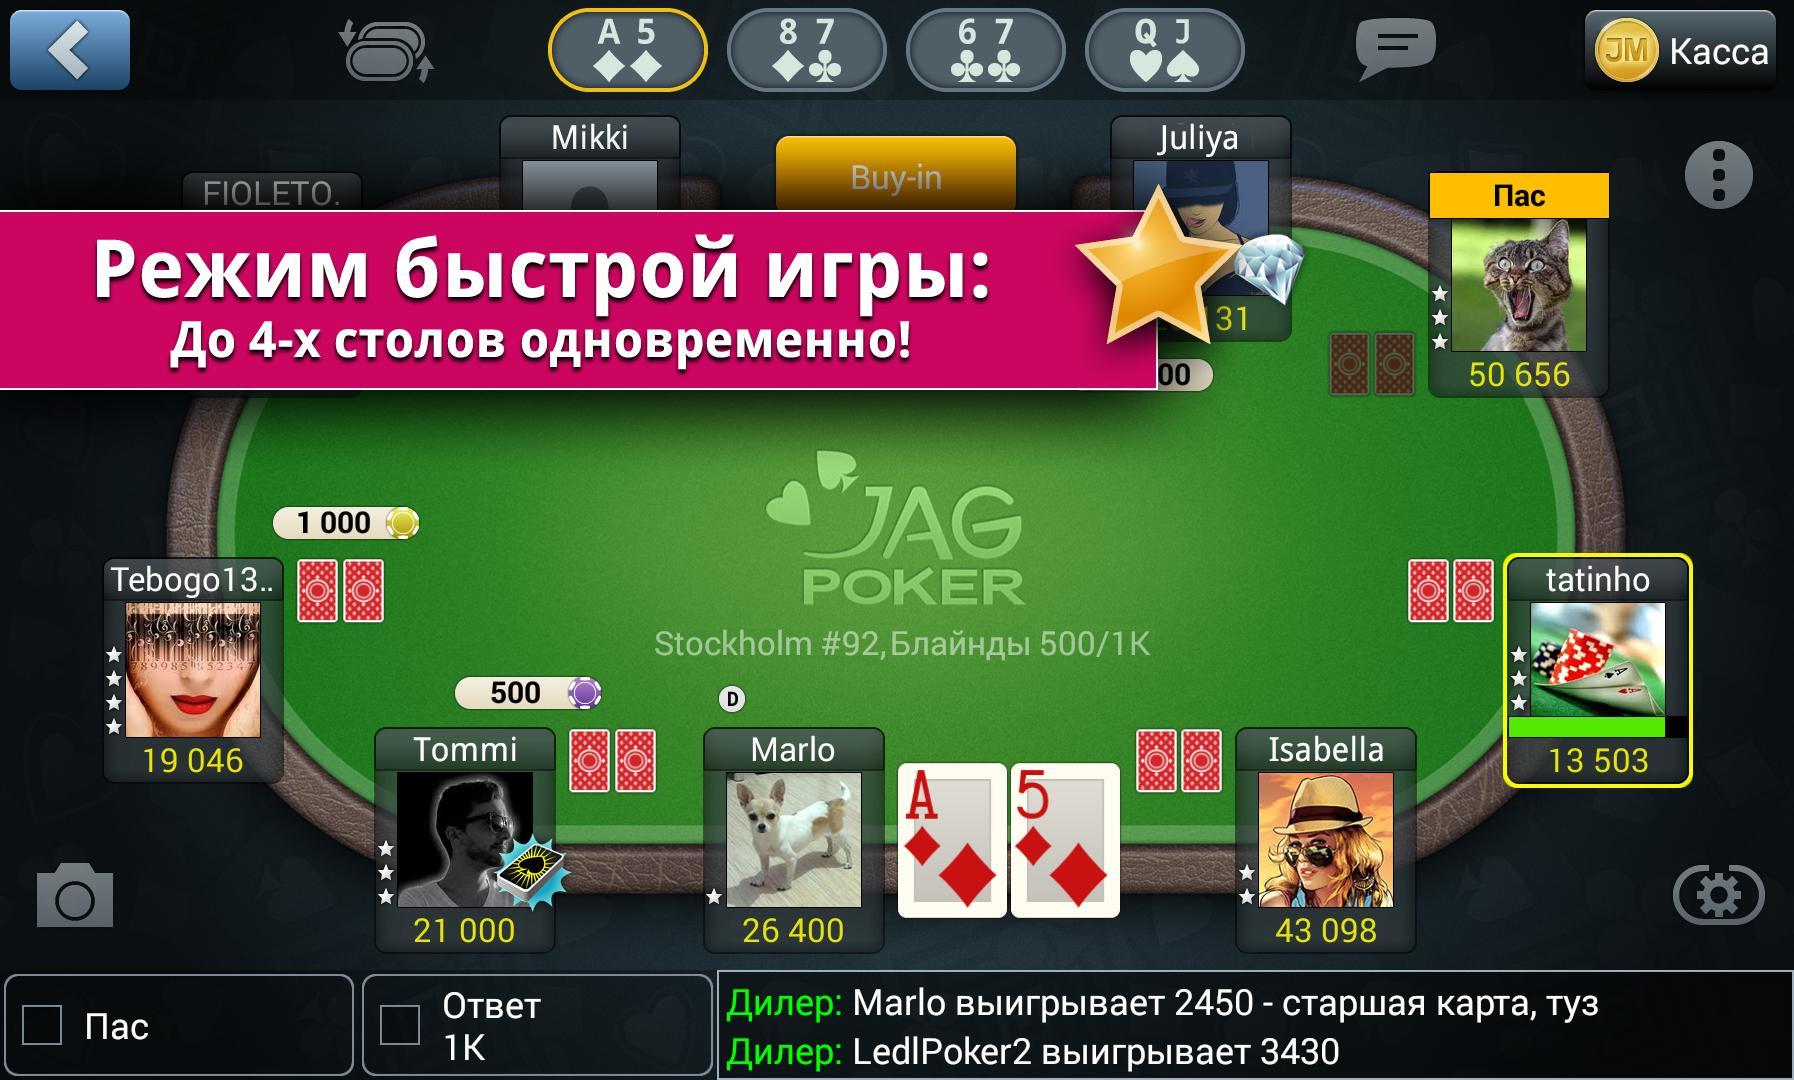 jagplay poker регистрация